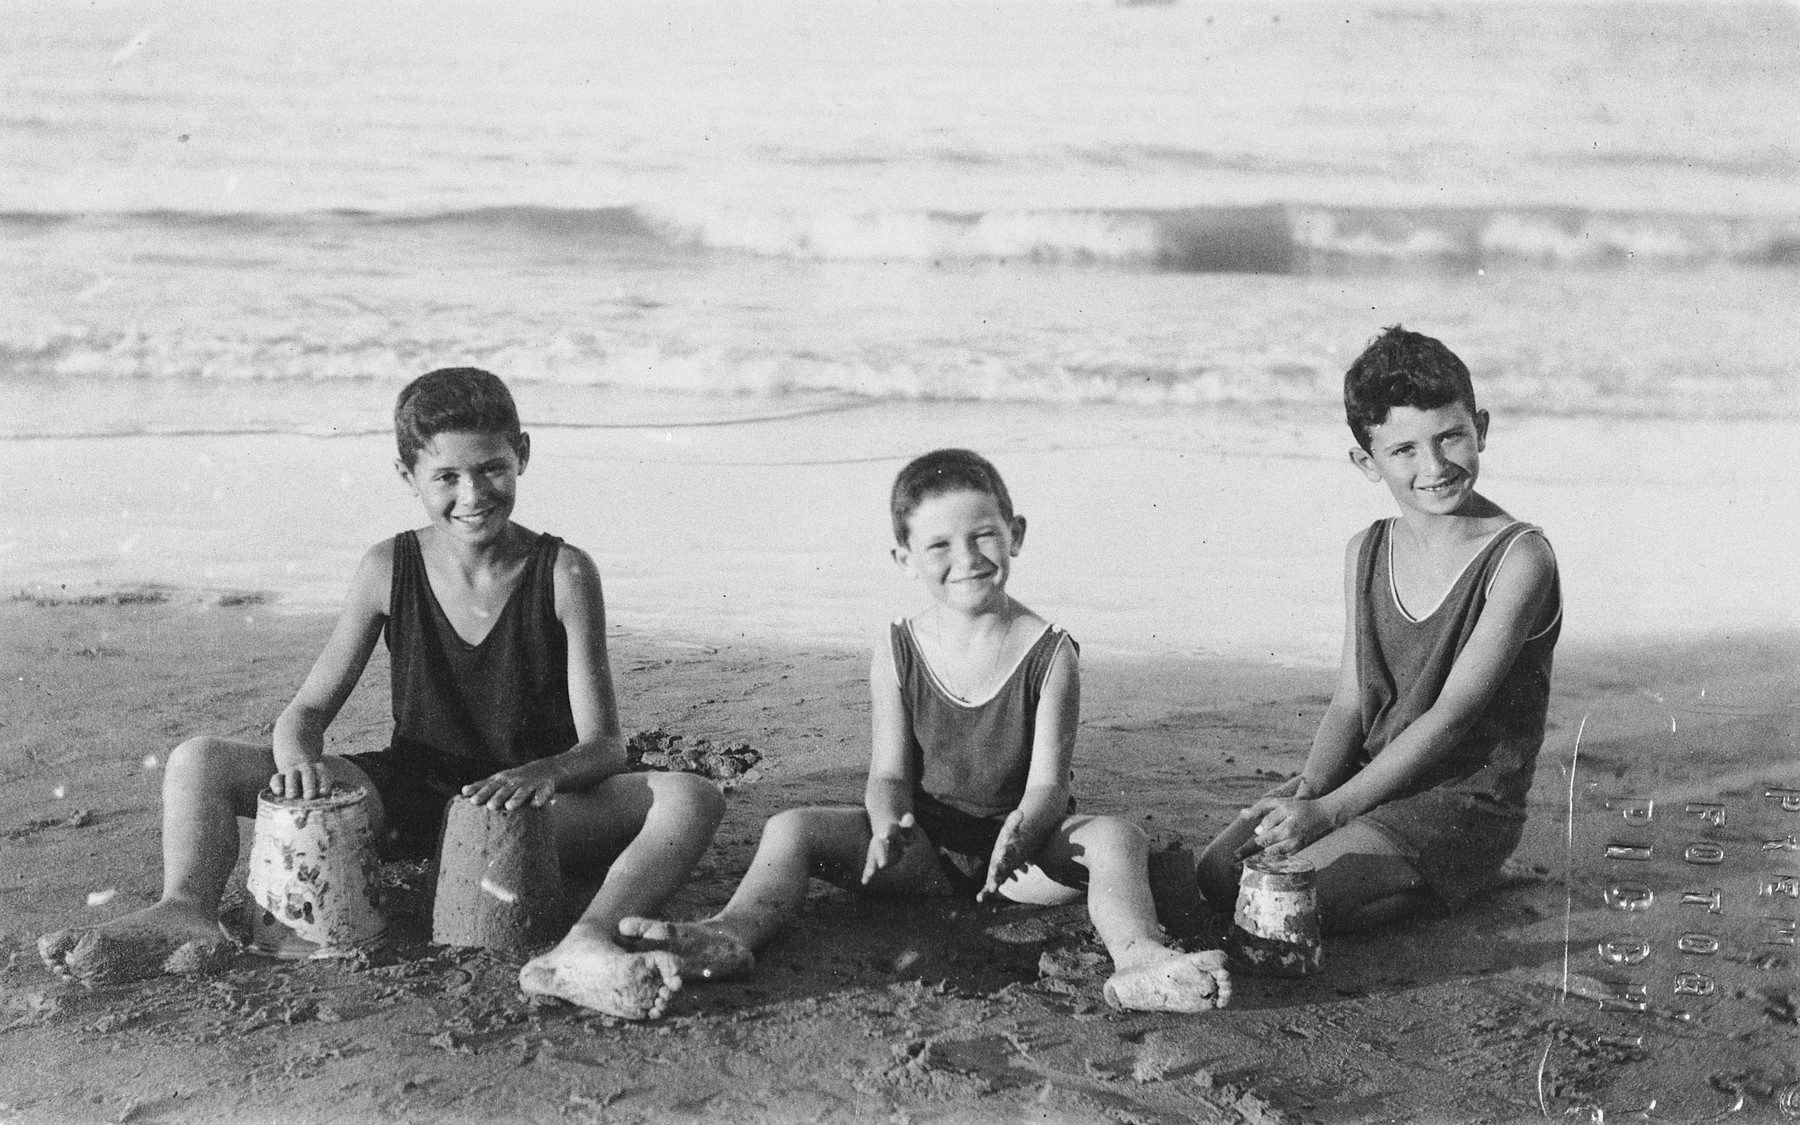 Three brothers build sandcastles at a beach near Bologna.  Pictured are Mancio, Immanuel and Aldo Ascarelli.